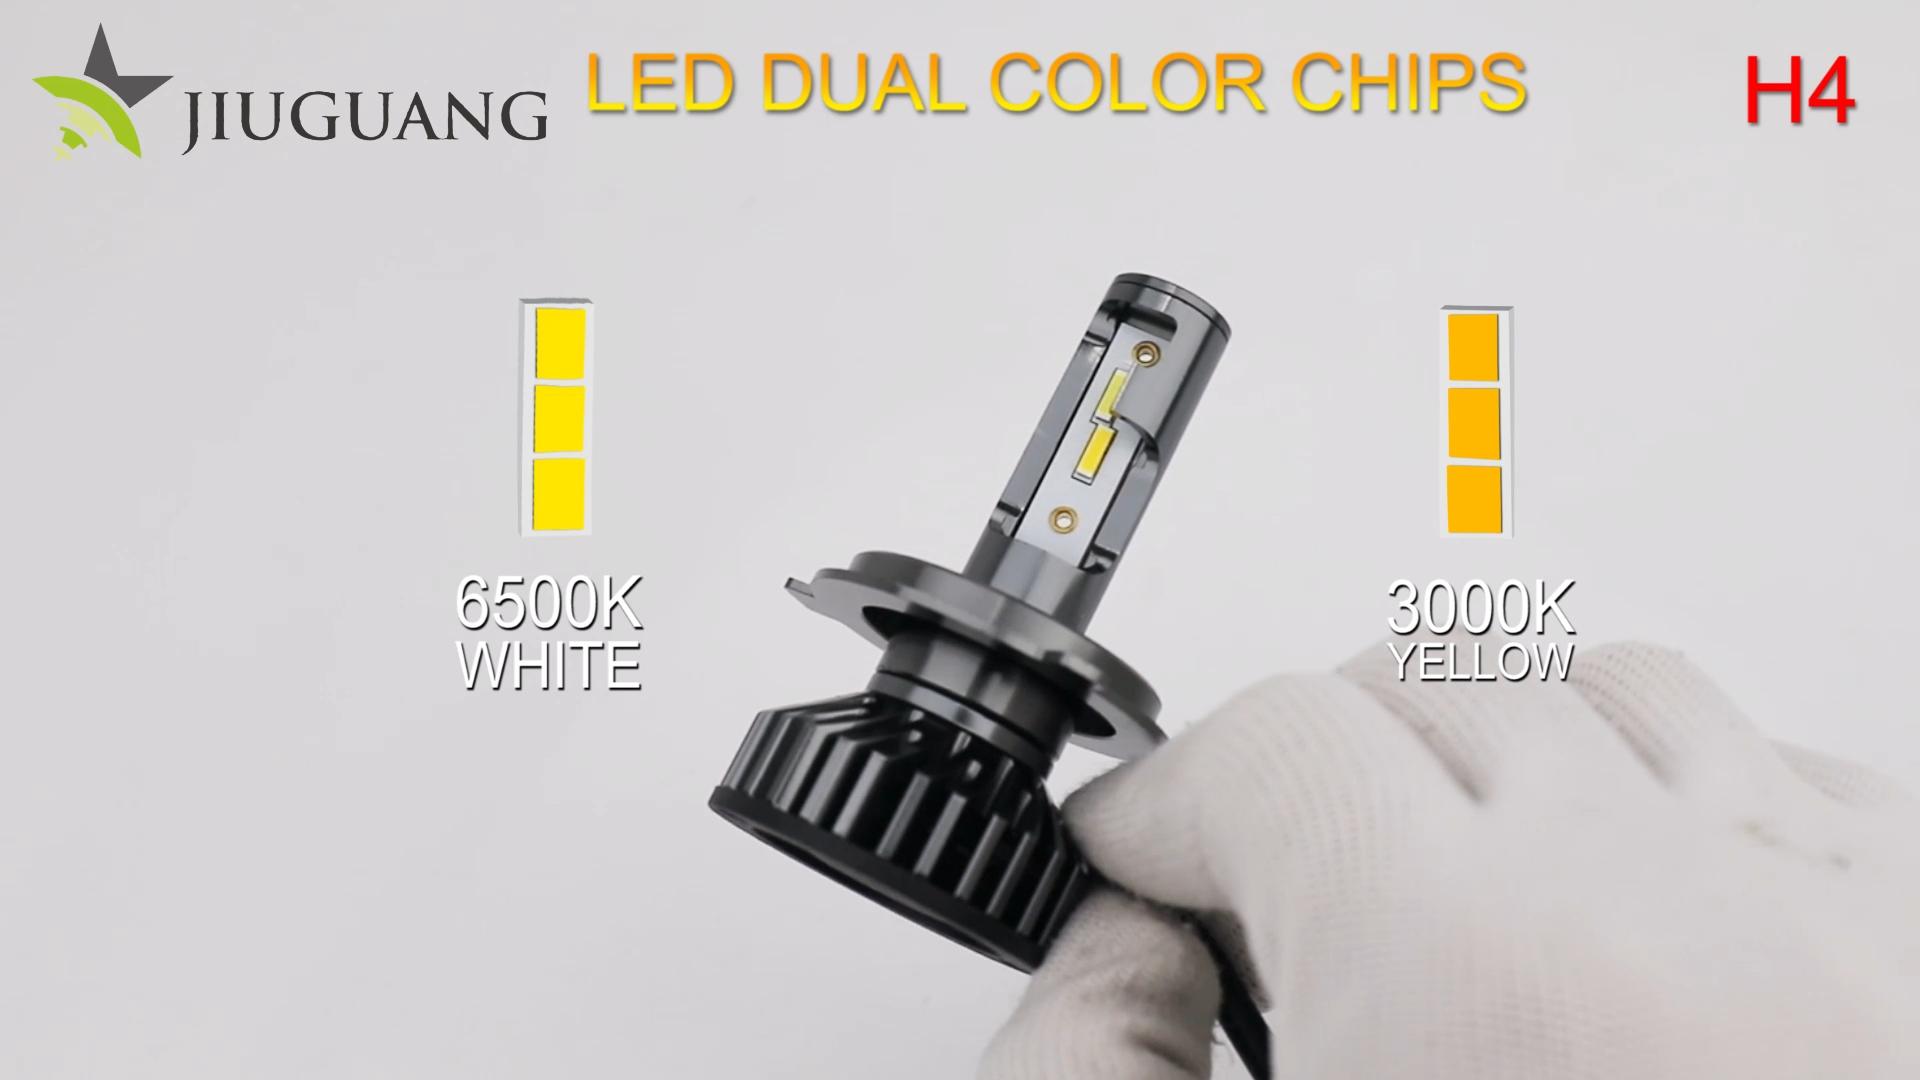 16000 Lumen Decoder ZES Cooling Fan H4 LED Car Light Bulb Mini H3 H11 9005 9006 880 H7 Led Canbus H7 F2 Led Headlights